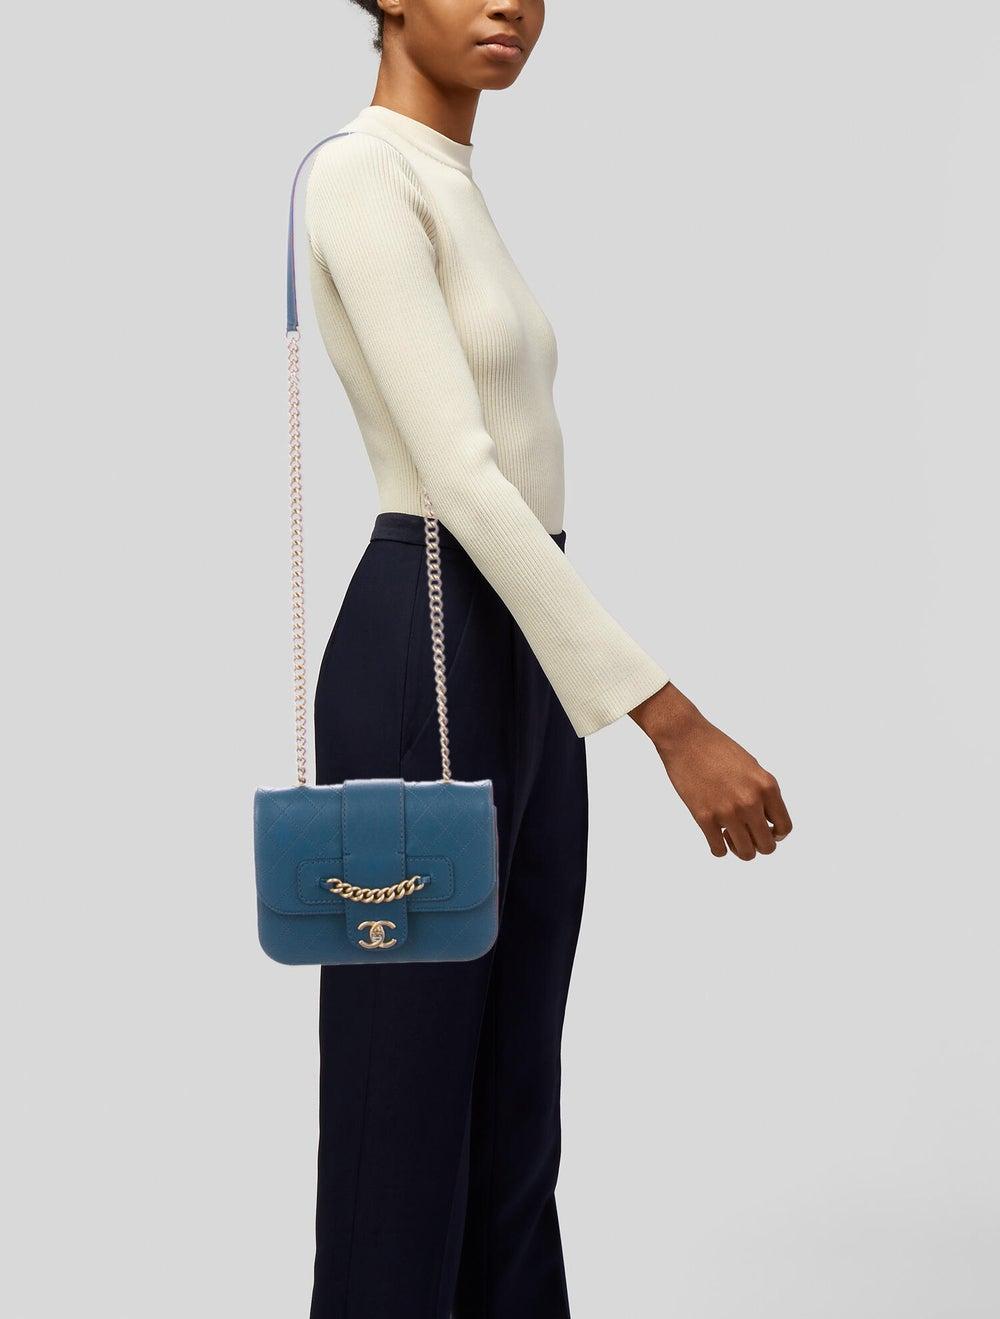 Chanel Front Chain Flap Bag Blue - image 2